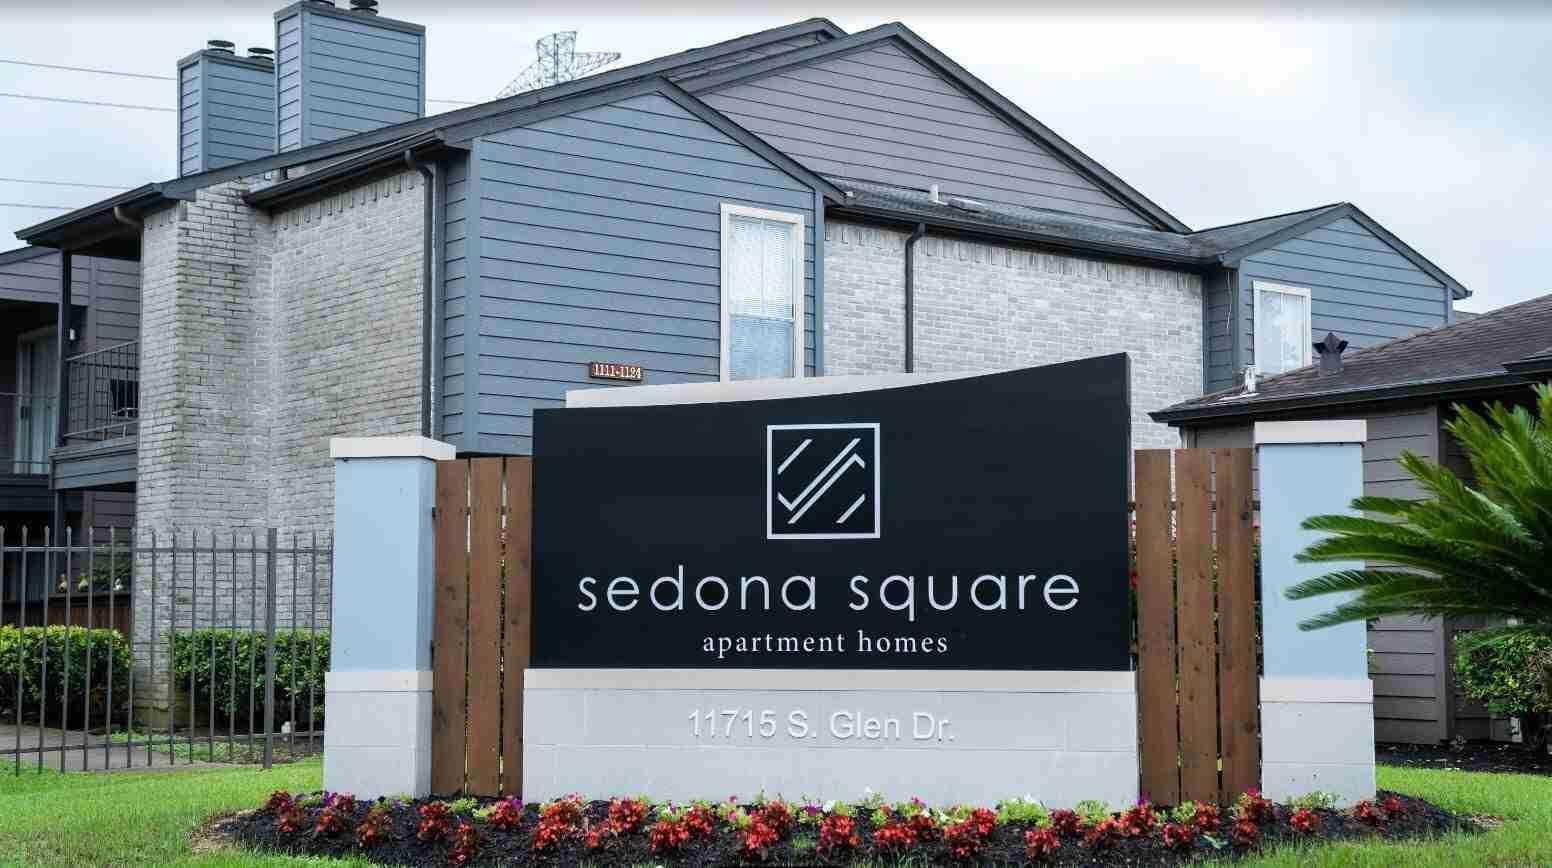 sedona square